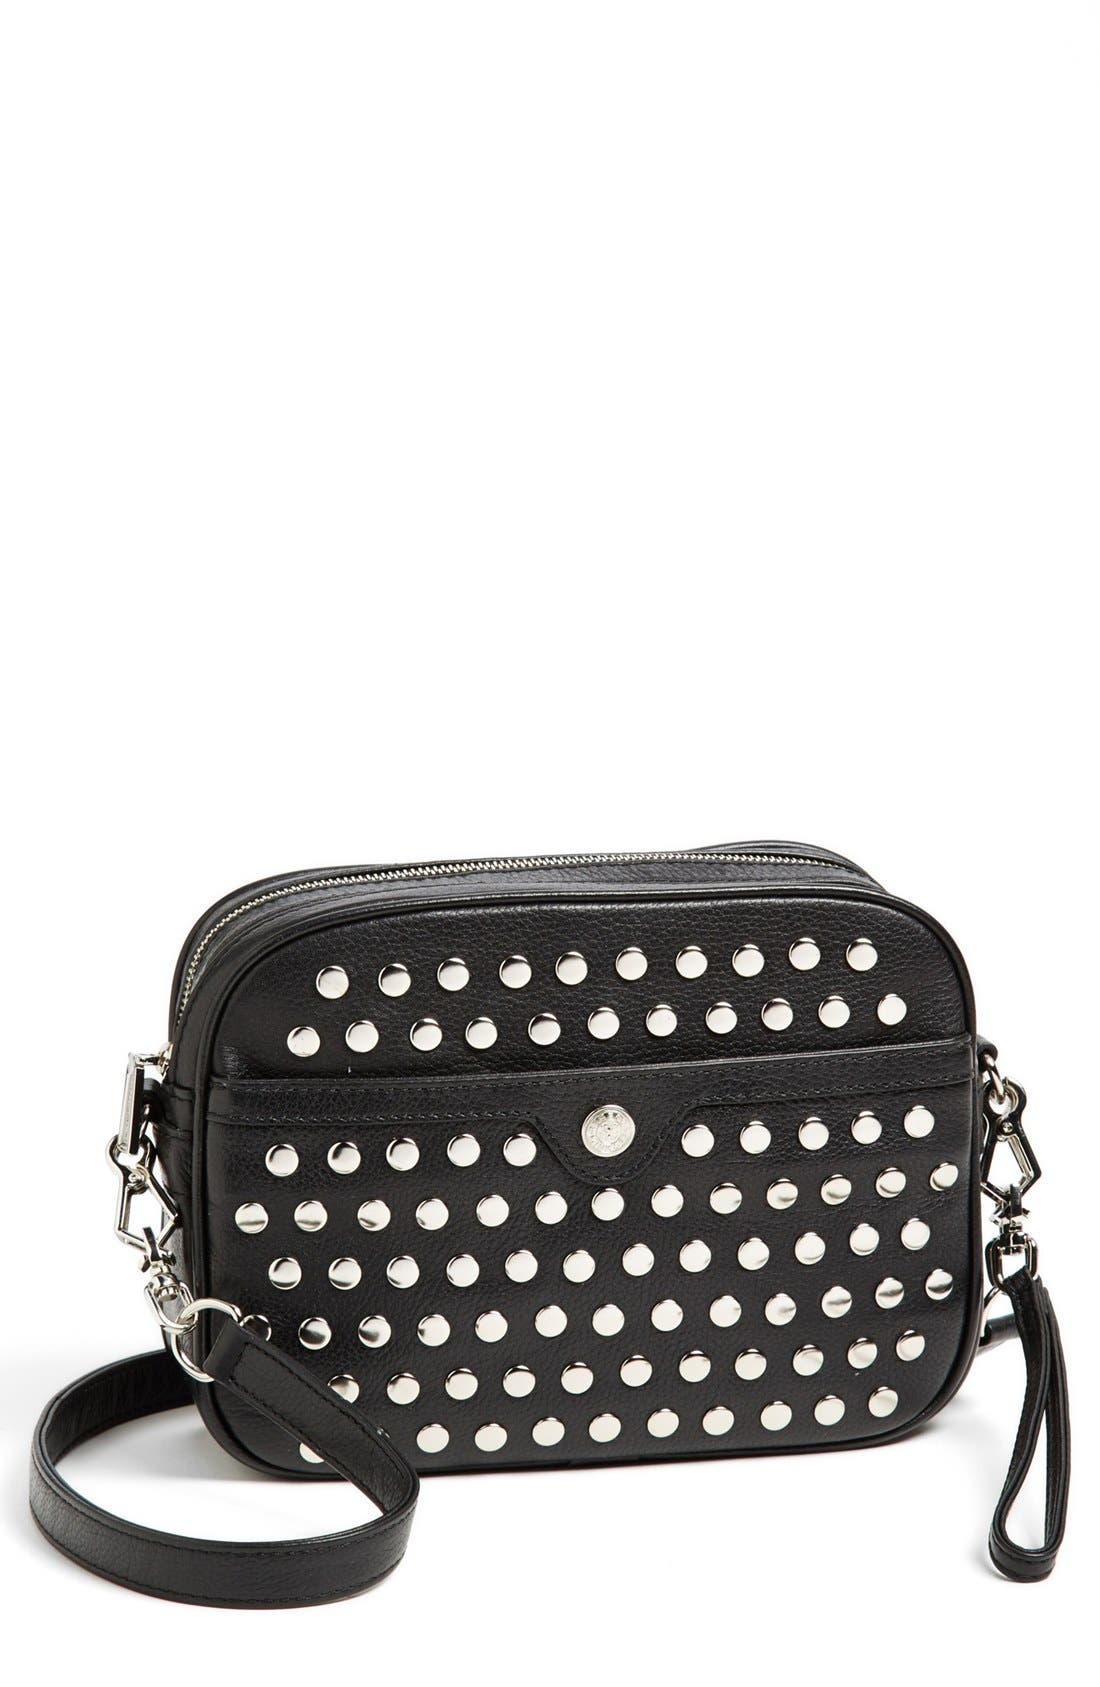 Alternate Image 1 Selected - Rebecca Minkoff 'Rumor' Leather Crossbody Bag, Small